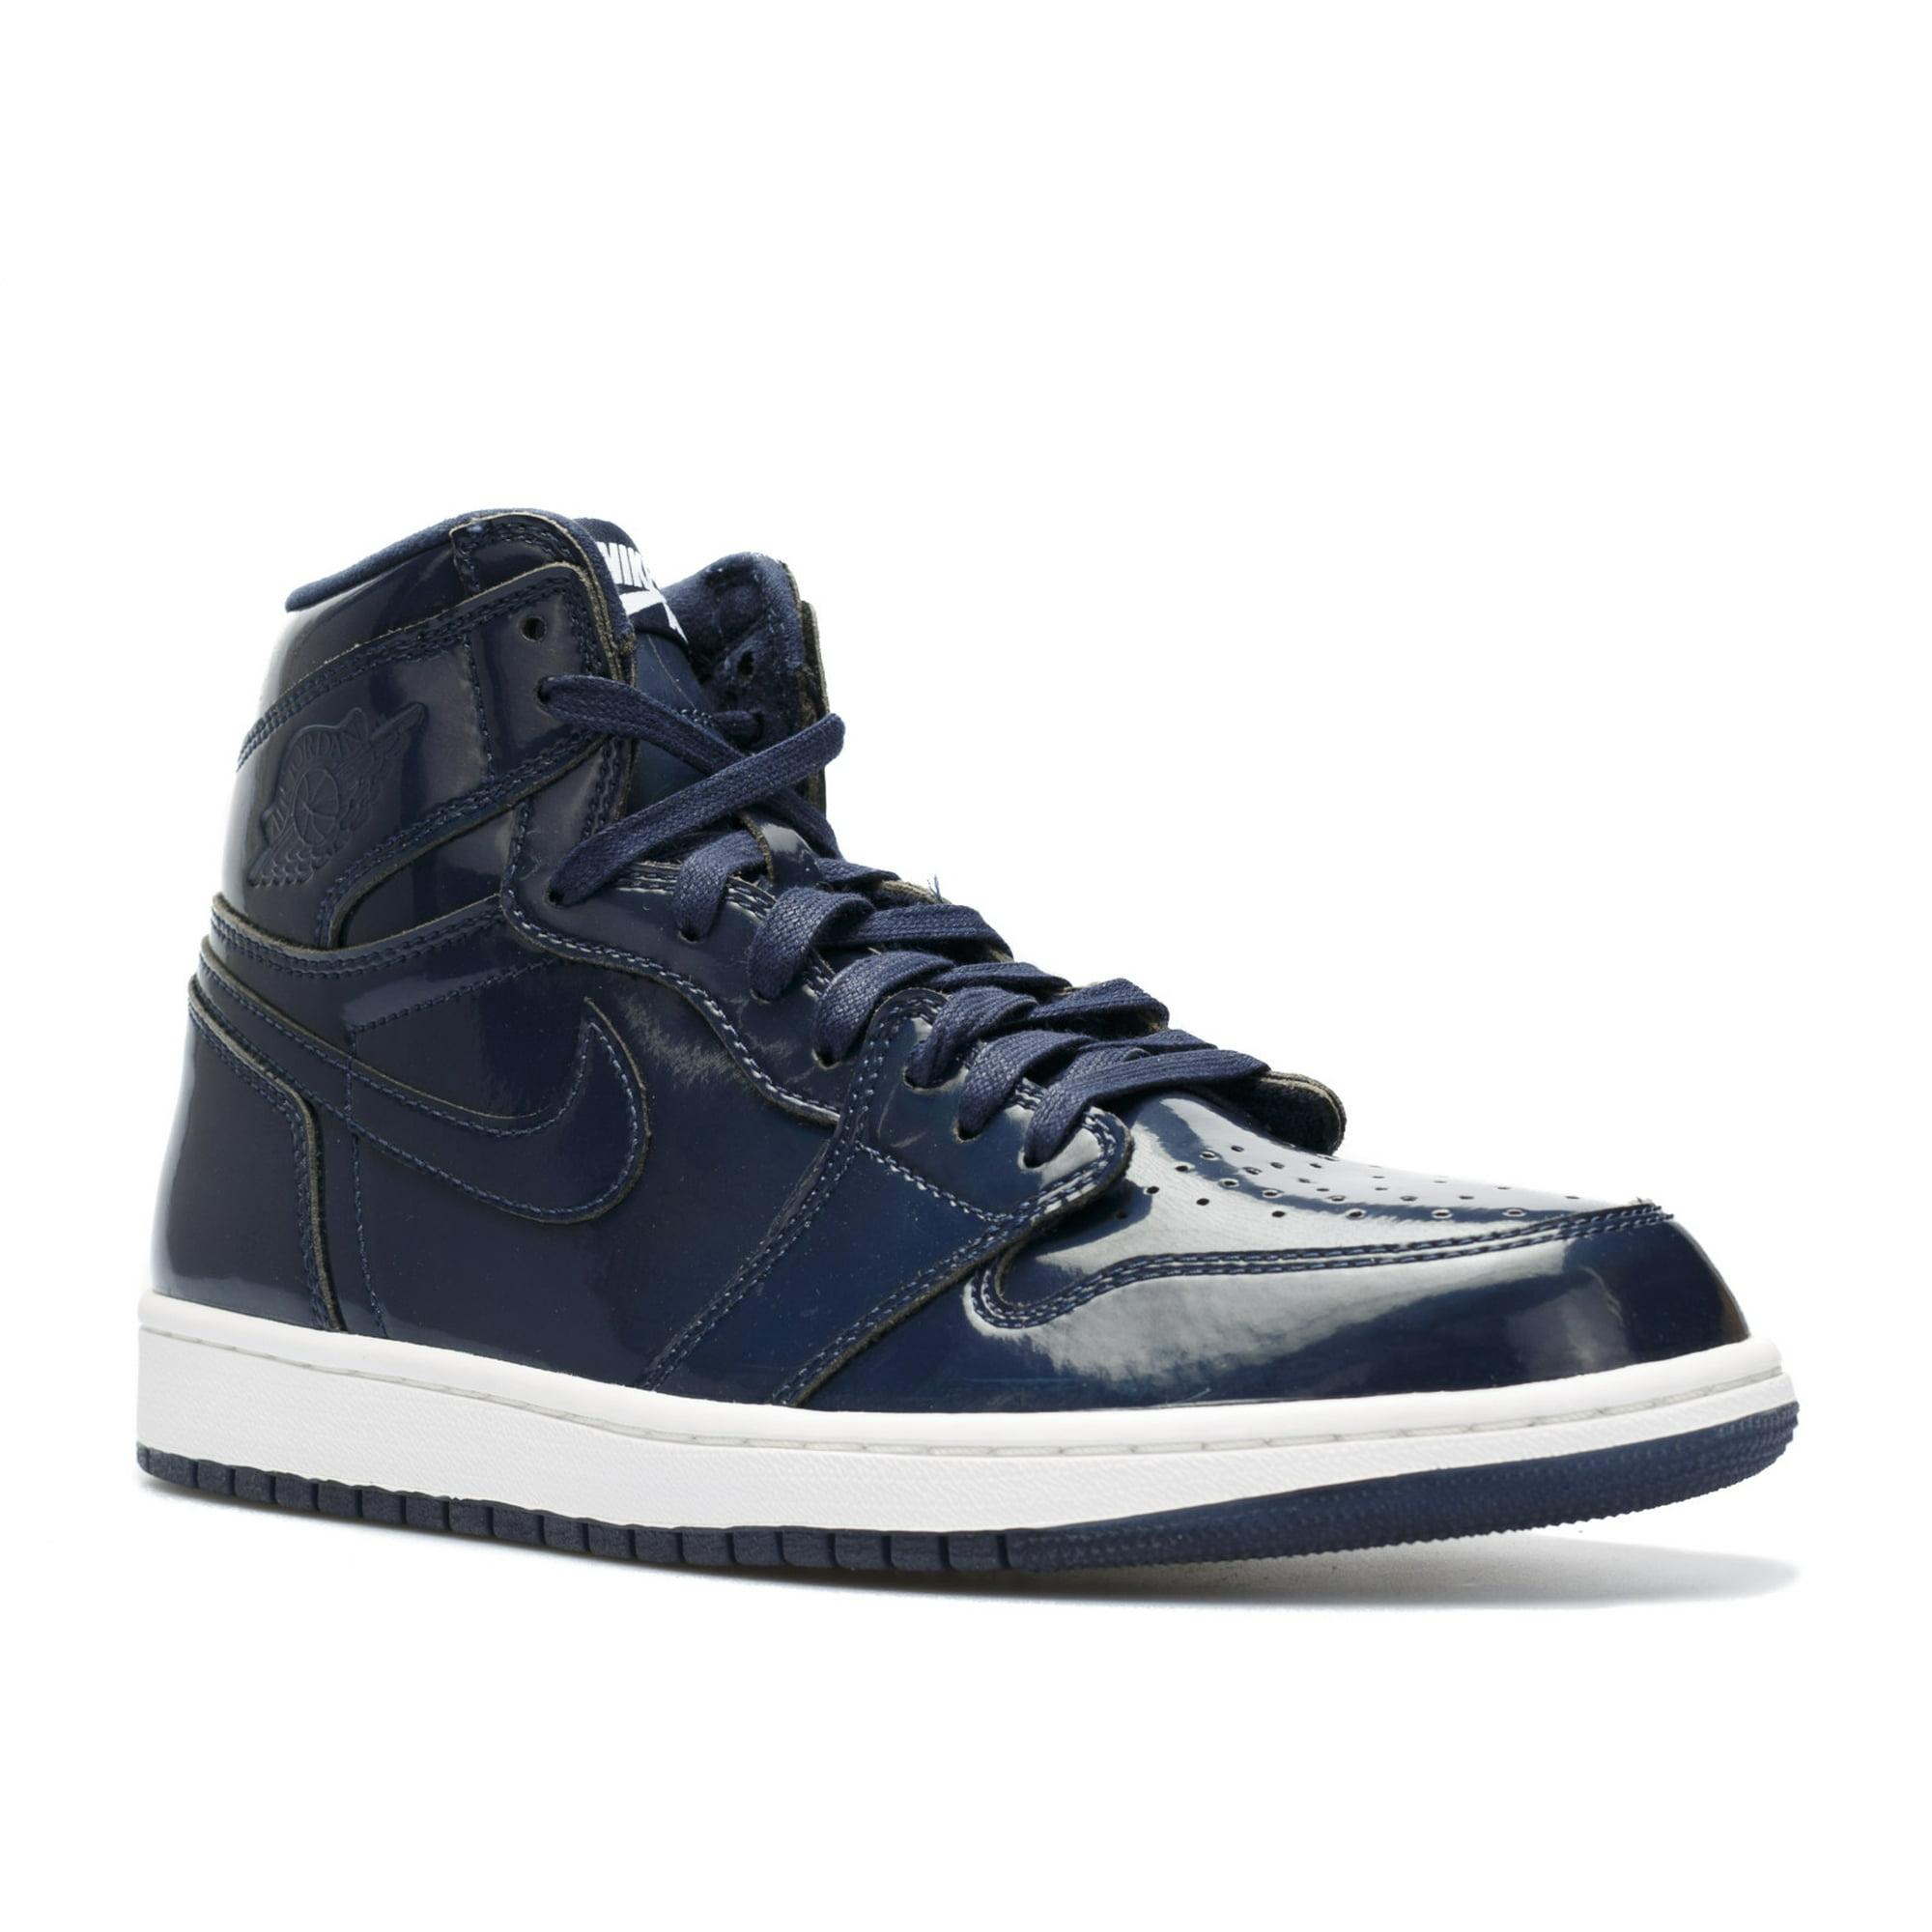 Air Jordan Men Air Jordan 1 Retro High Og Dsm 'Dsm